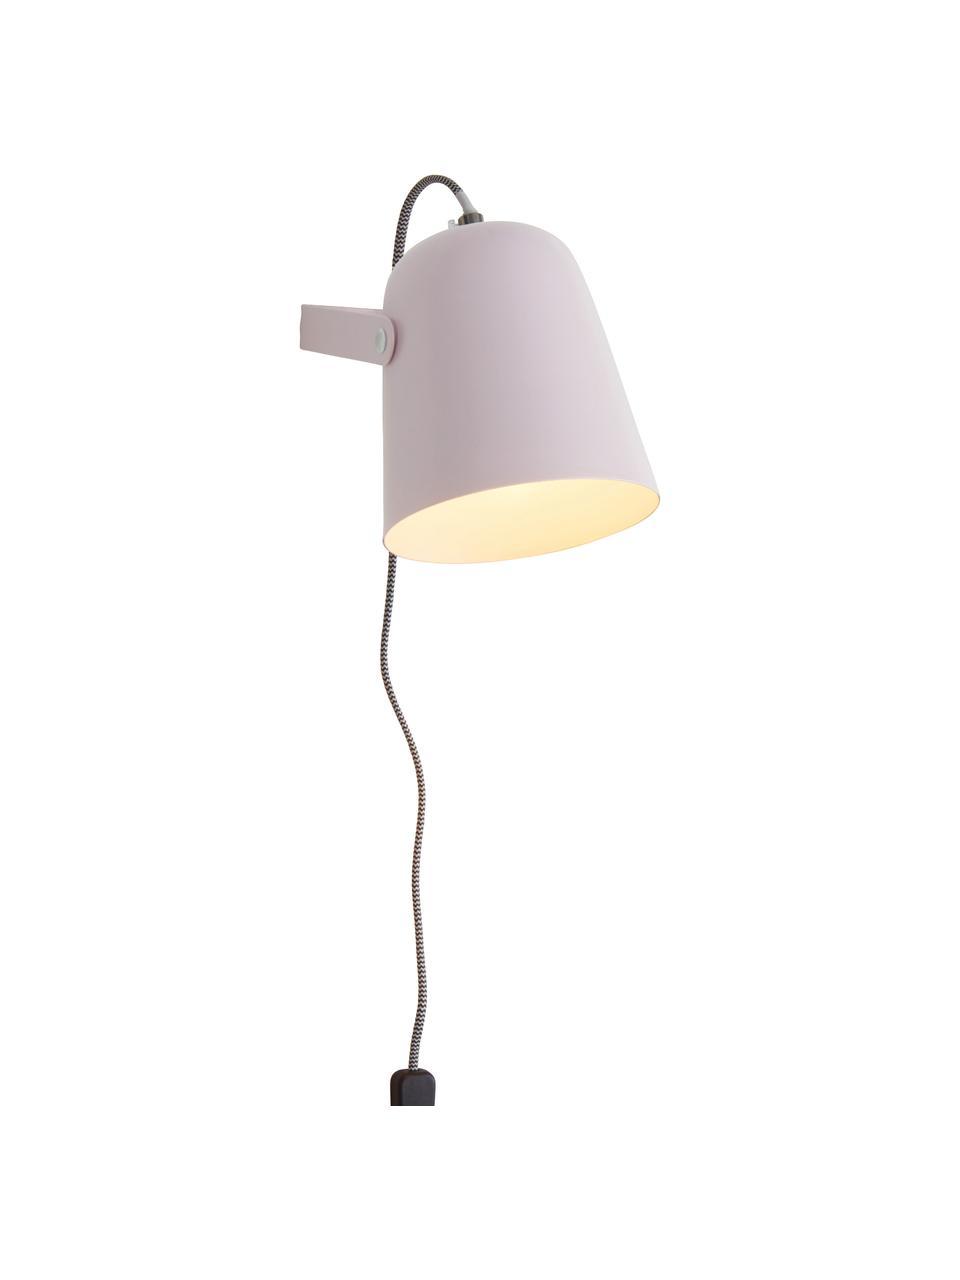 Wandleuchte Iluminar mit Stecker in Rosa, Lampenschirm: Metall, lackiert, Rosa, 14 x 18 cm